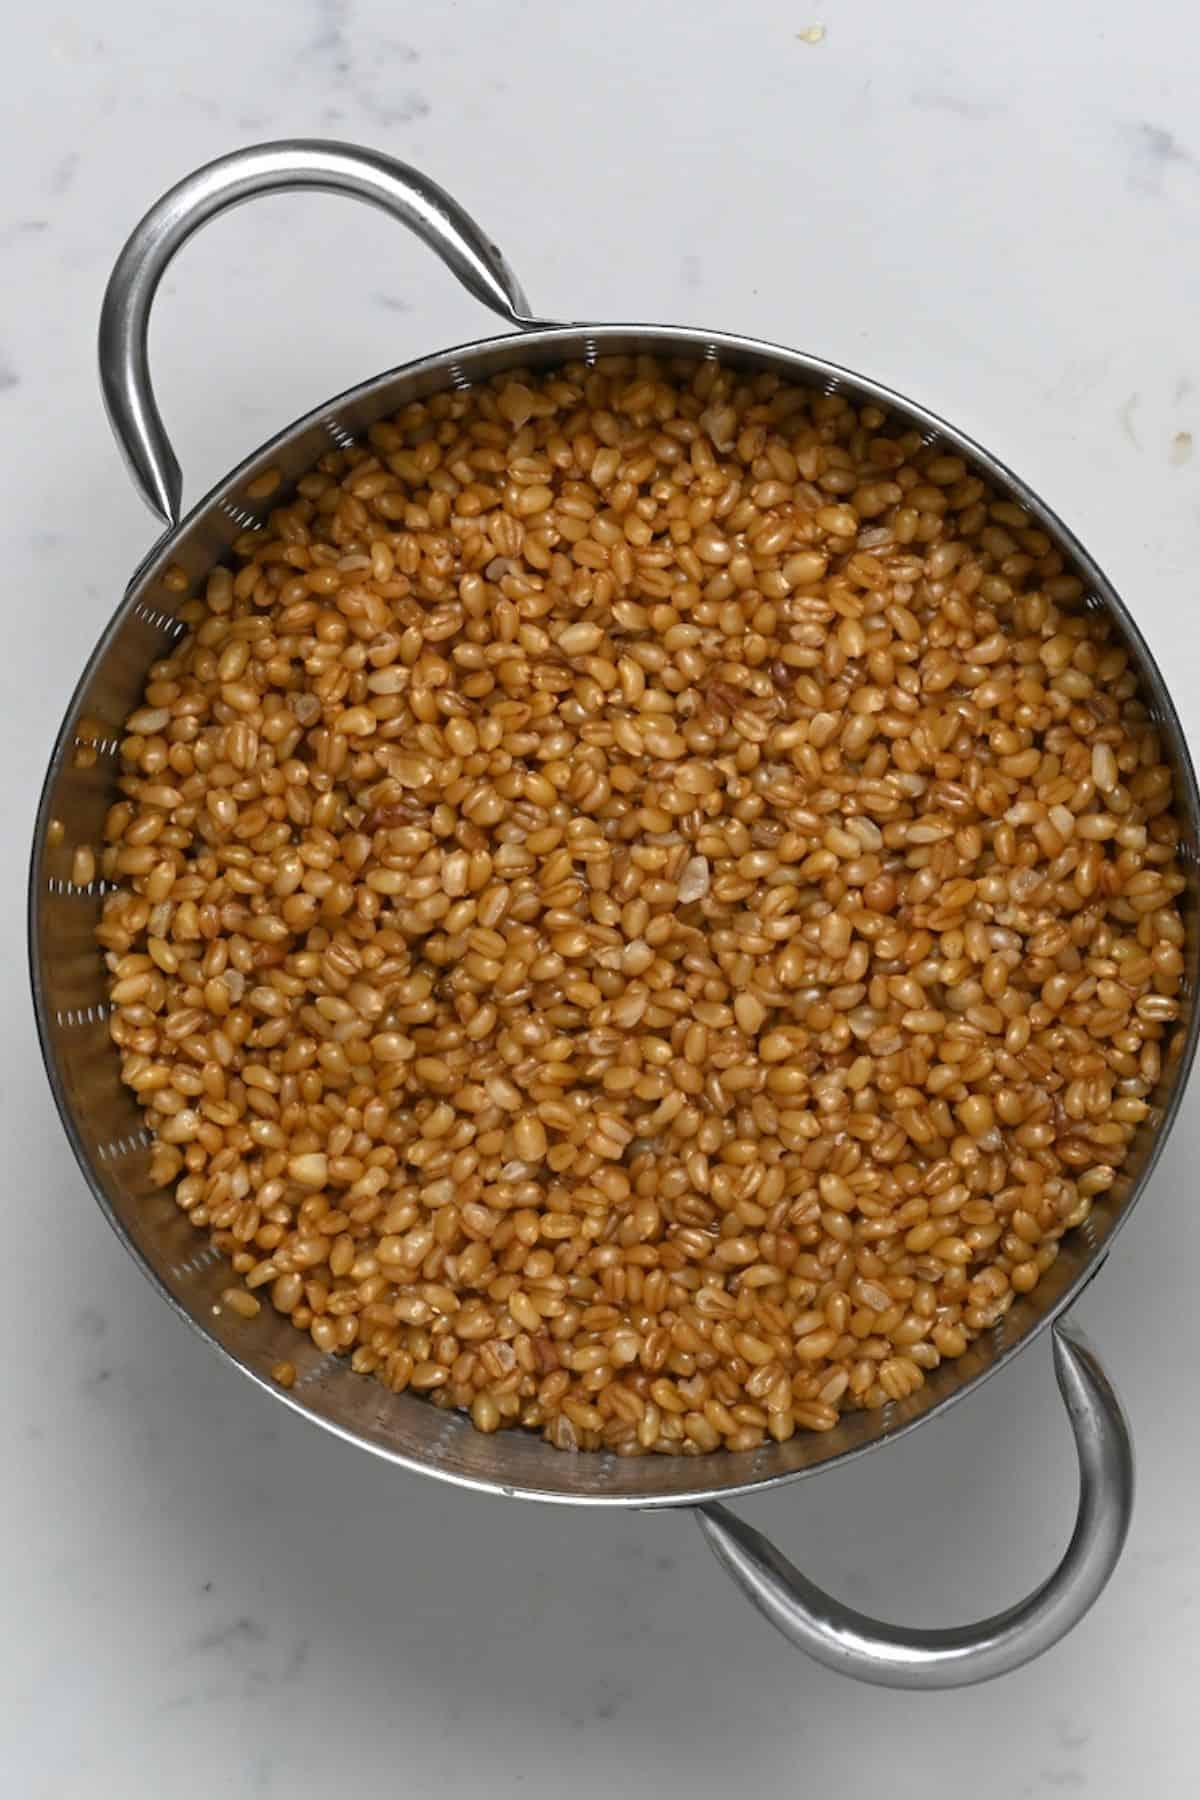 Cooked bulgur wheat